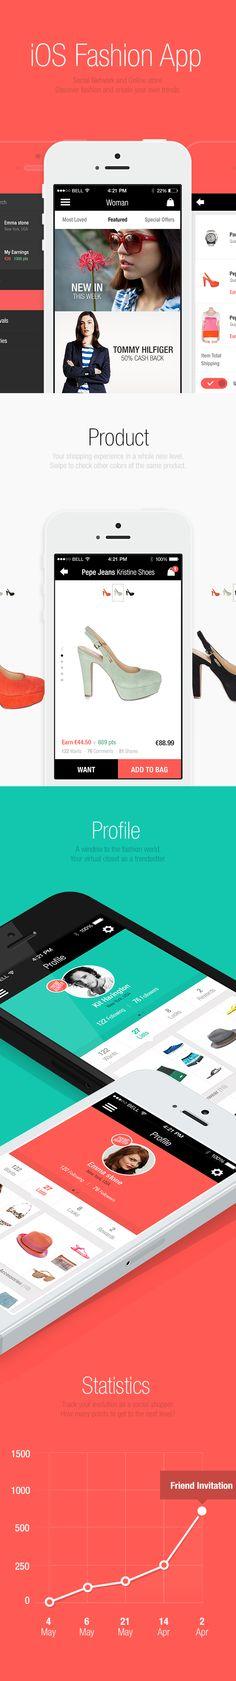 Fashion Network iOS App by André Oliveira, via Behance #app #design #ux #ui…